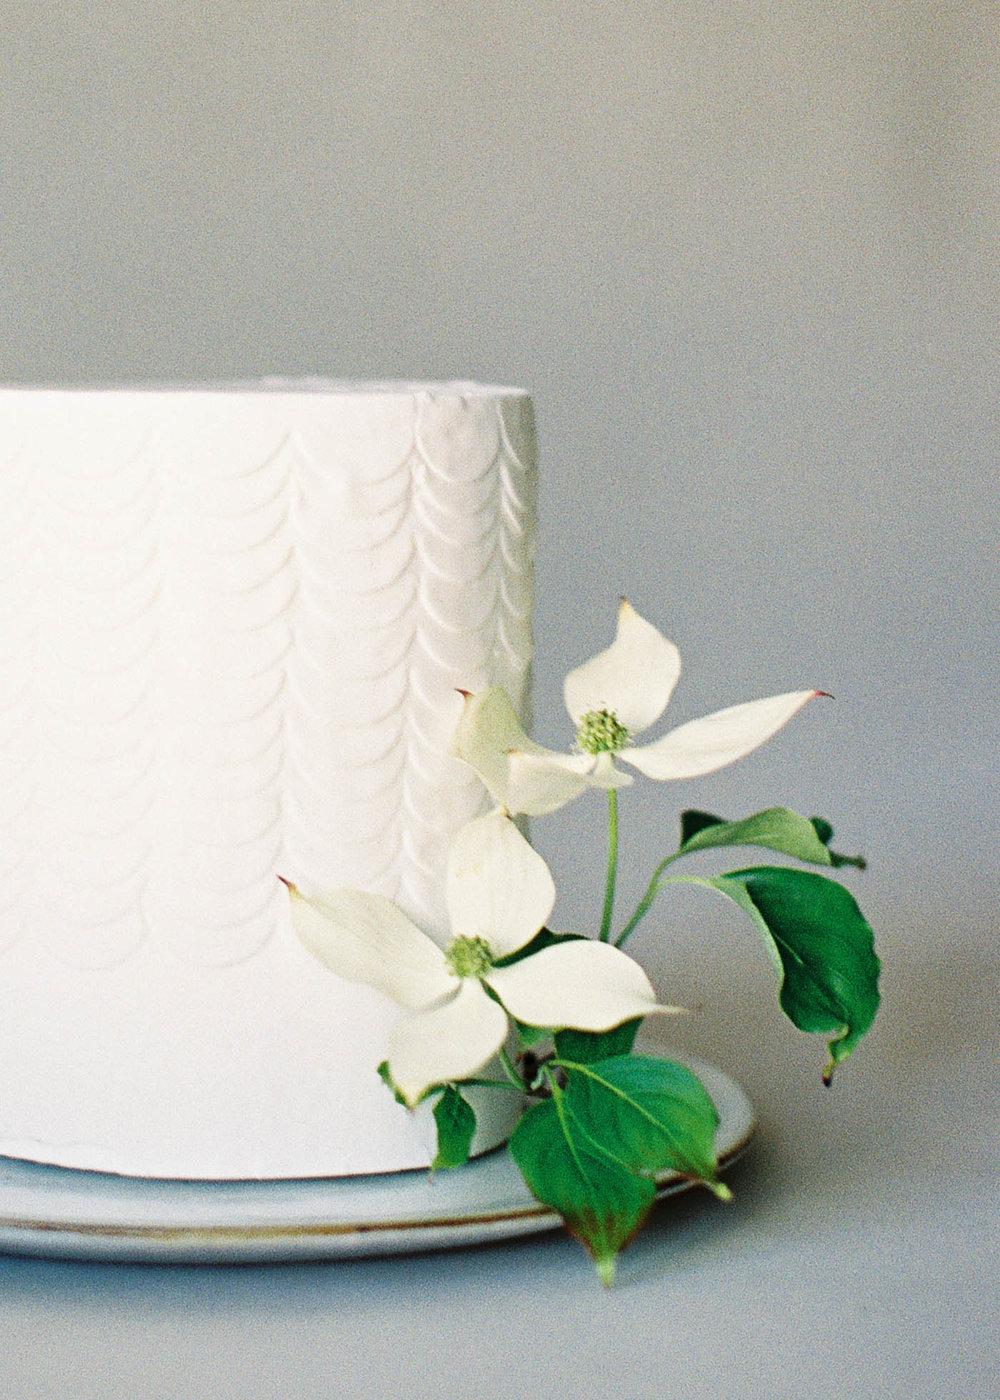 naturalist-cakes-15-Jen_Huang-000486-R1-075-36.jpg